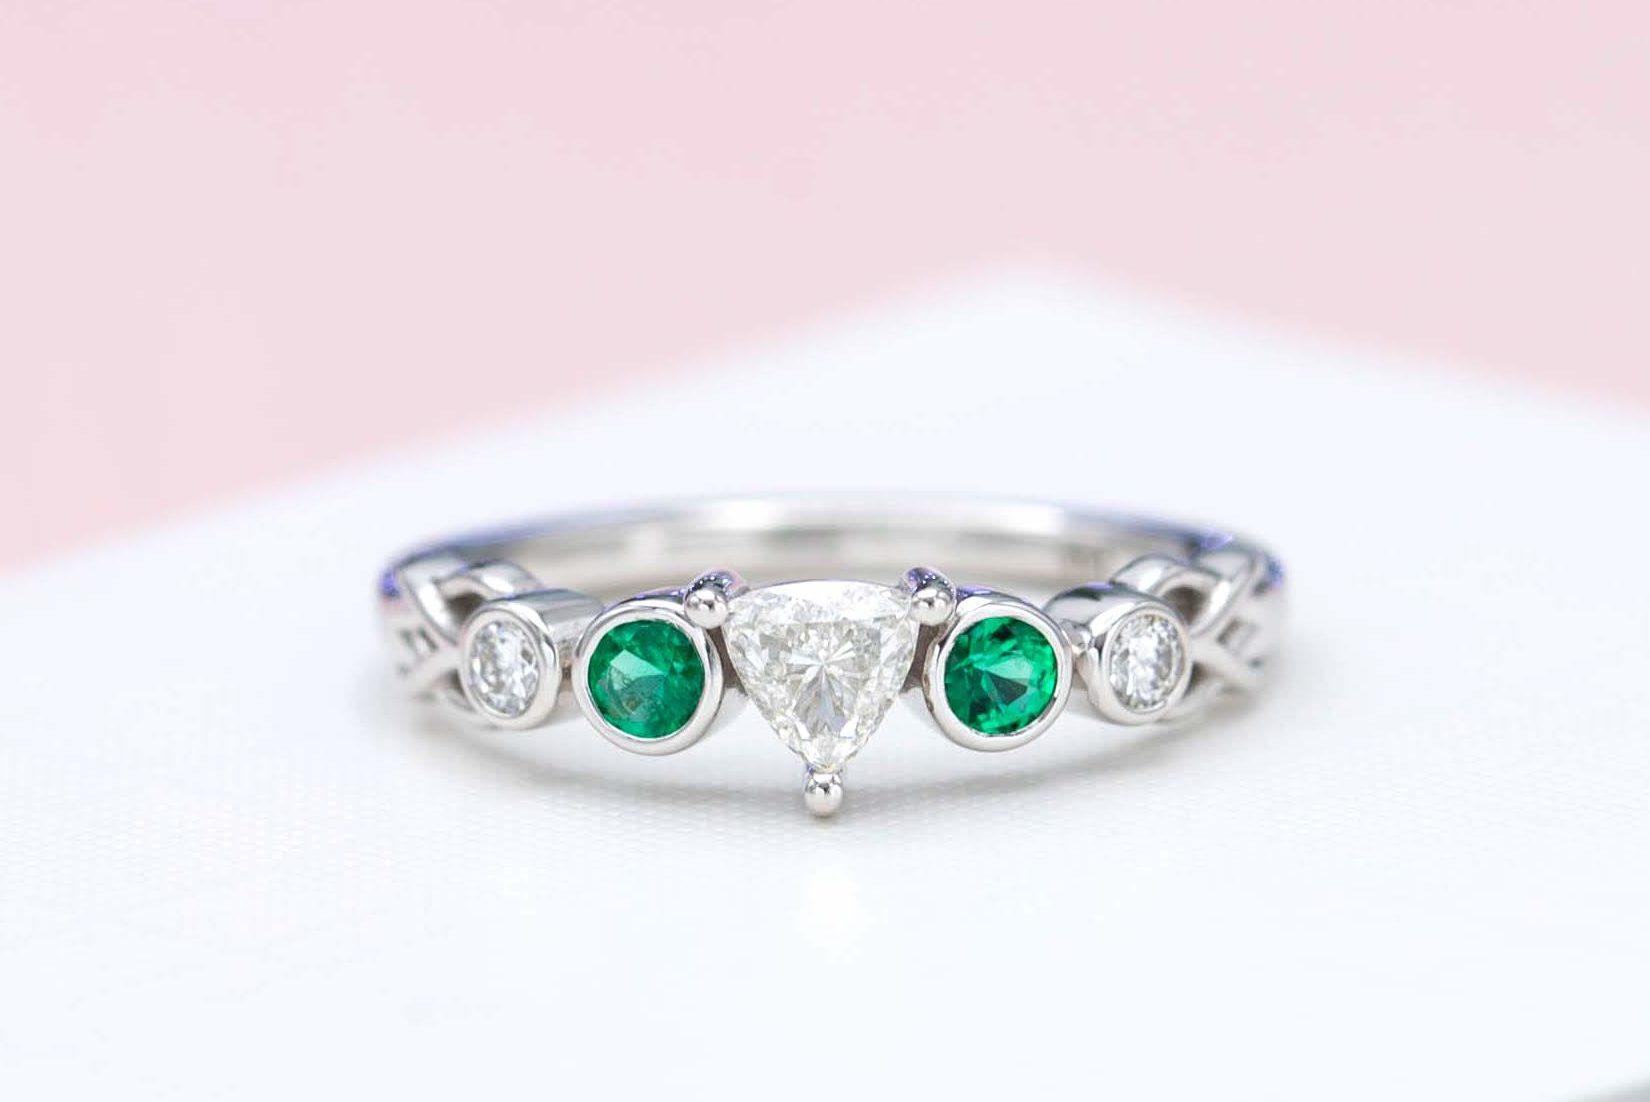 trillion-cut diamond and emerald engagement ring